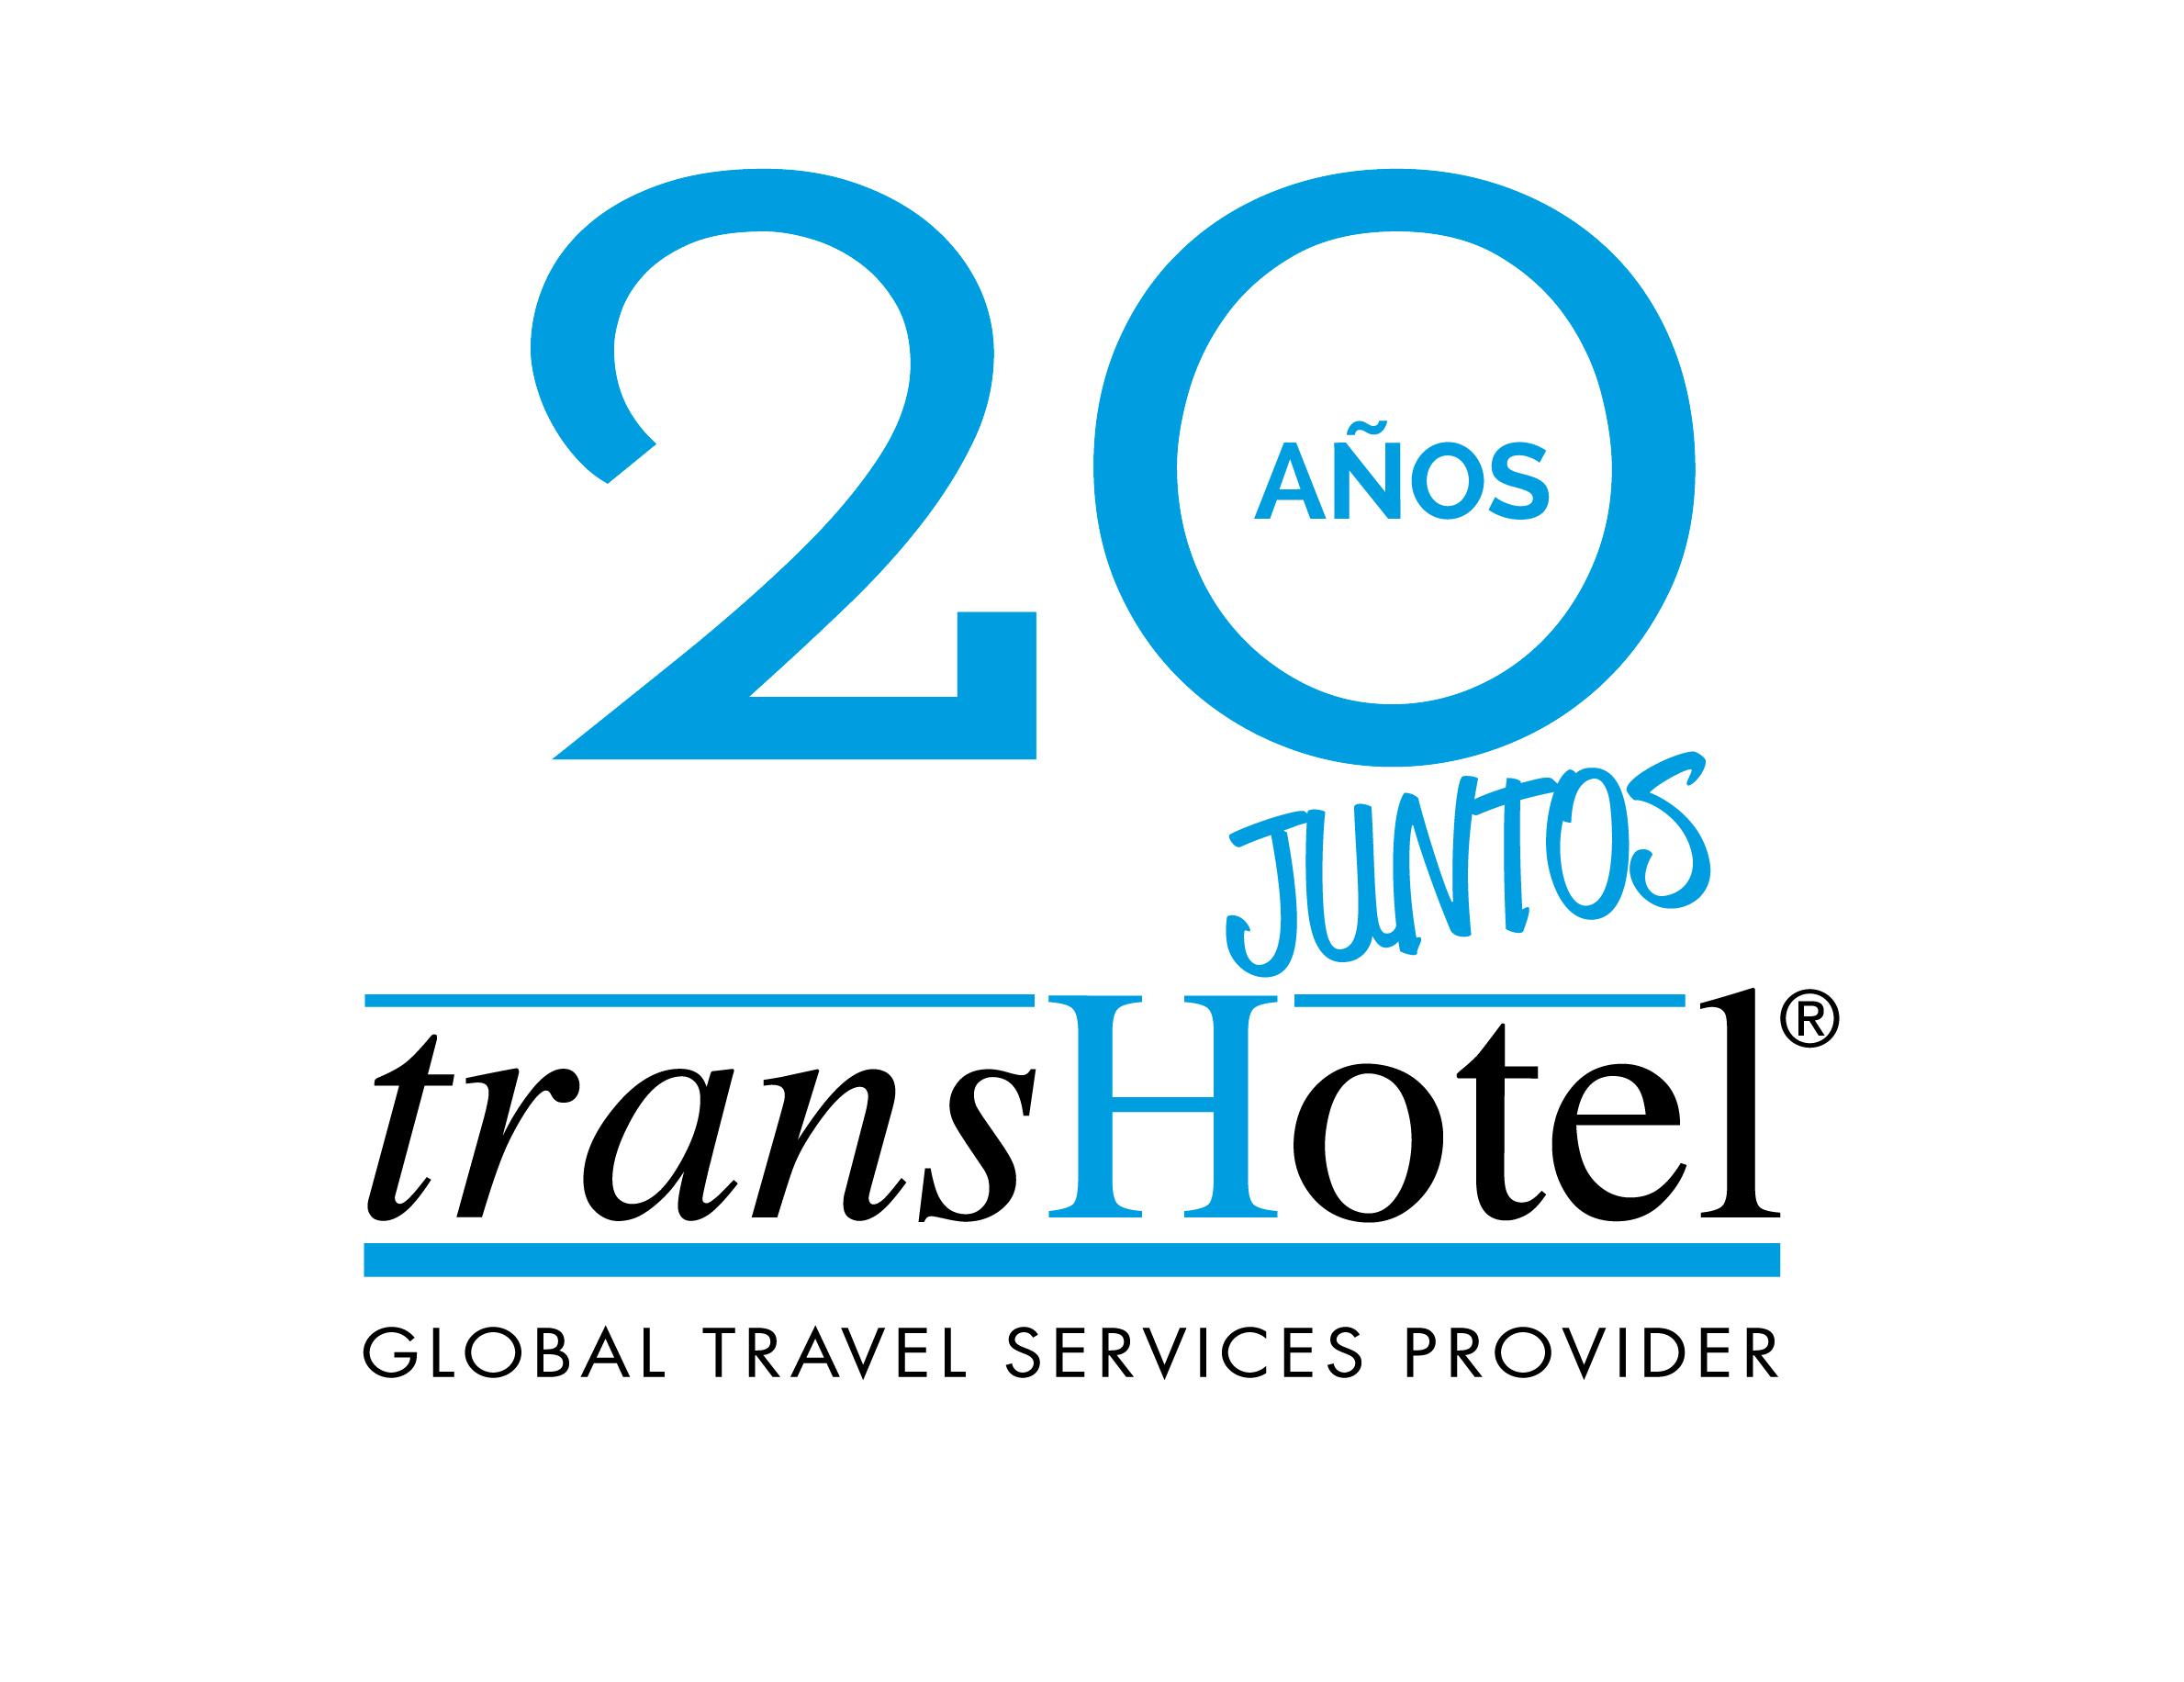 Logo Transhotel